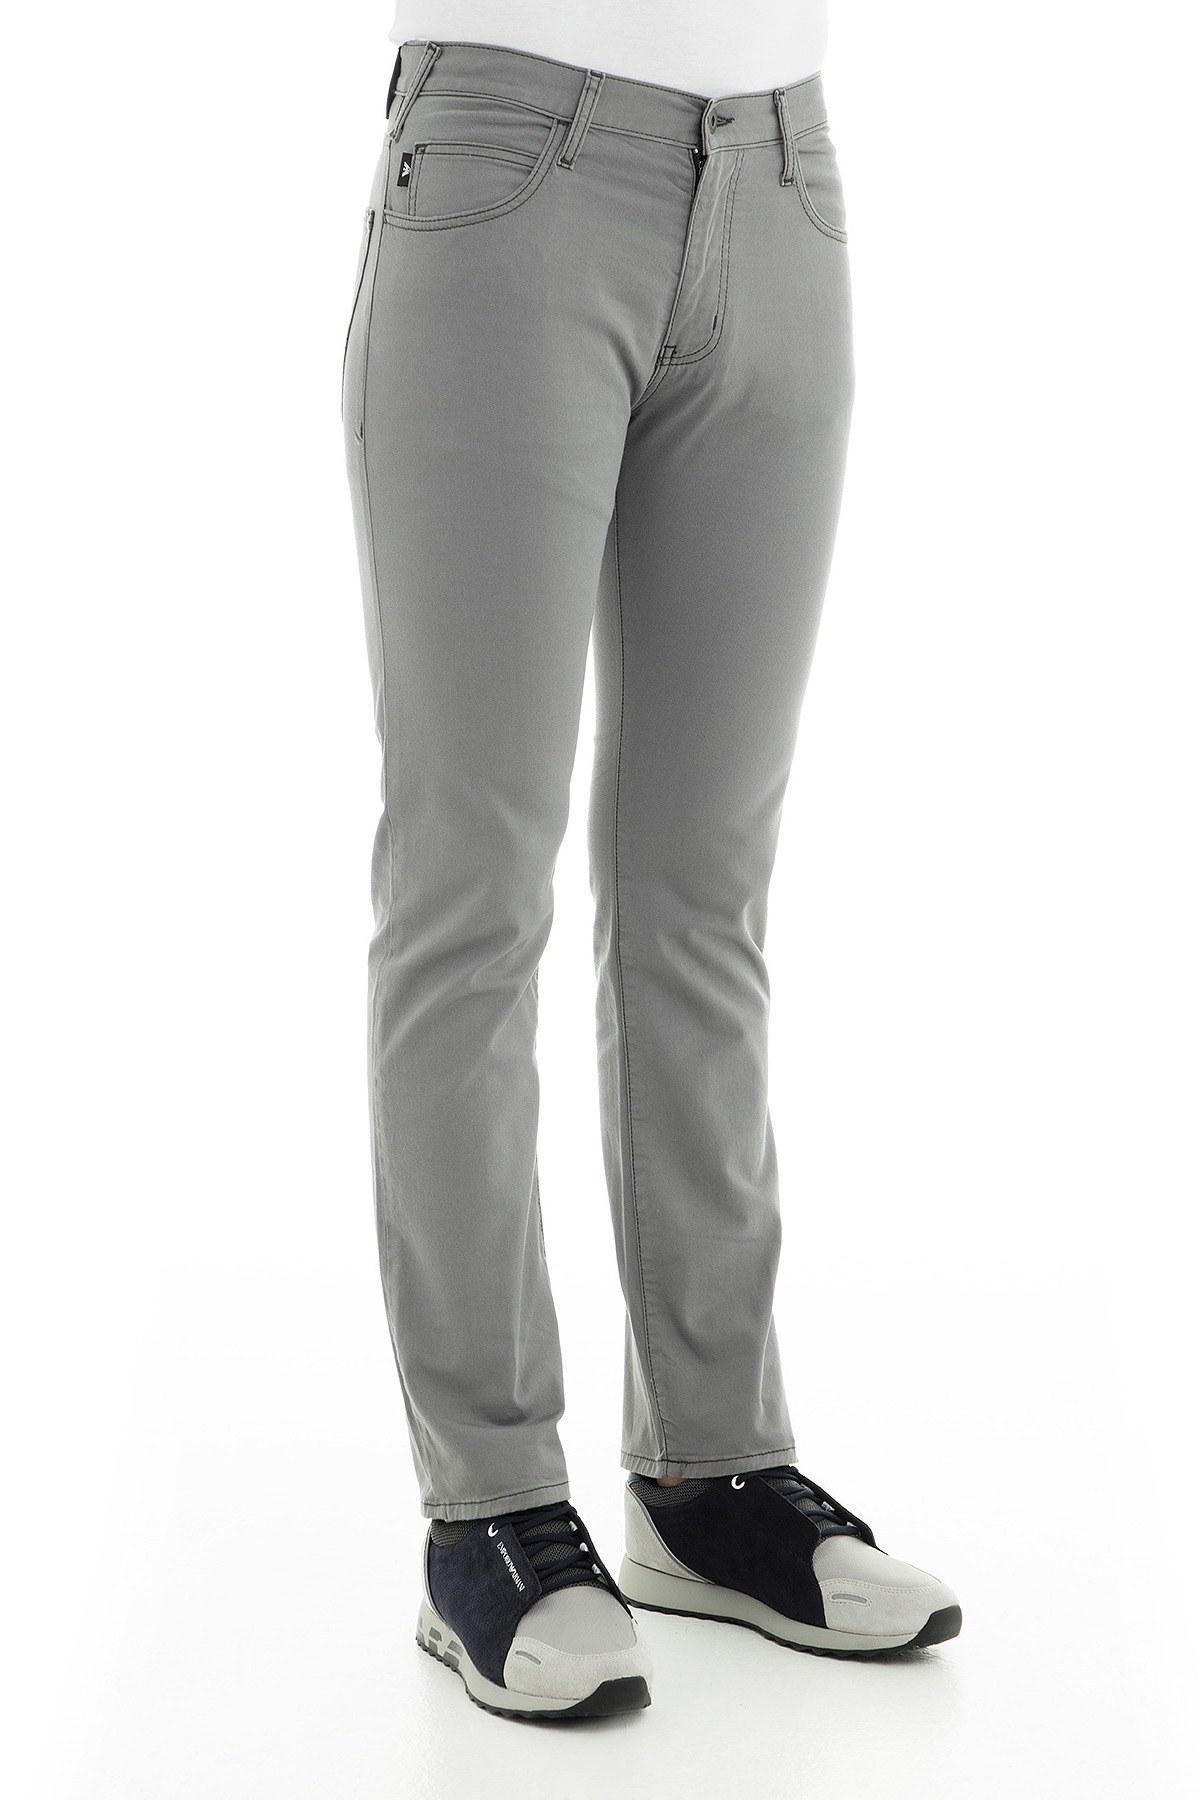 Emporio Armani J45 Jeans Erkek Pamuklu Pantolon 8N1J45 1N0LZ 0644 GRİ